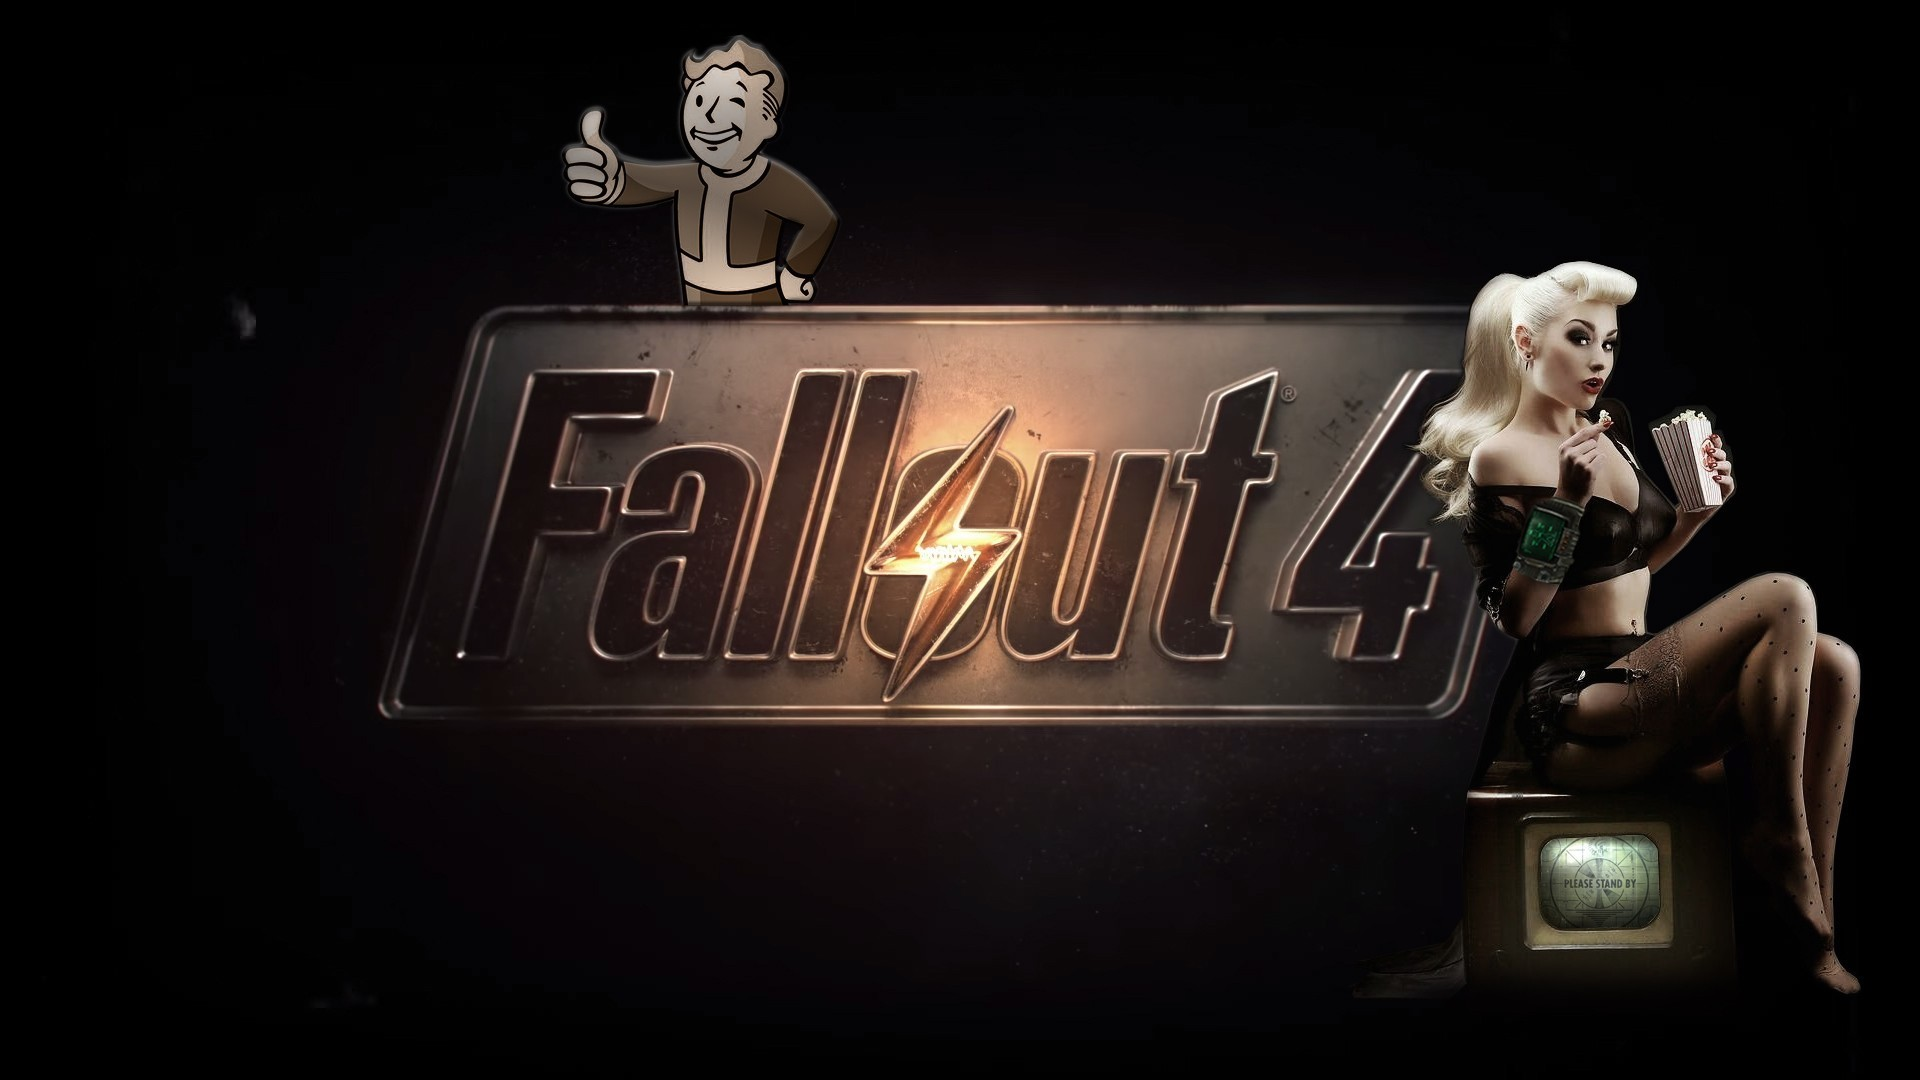 Fallout 4, Fallout, Girl, Game wallpaper thumb